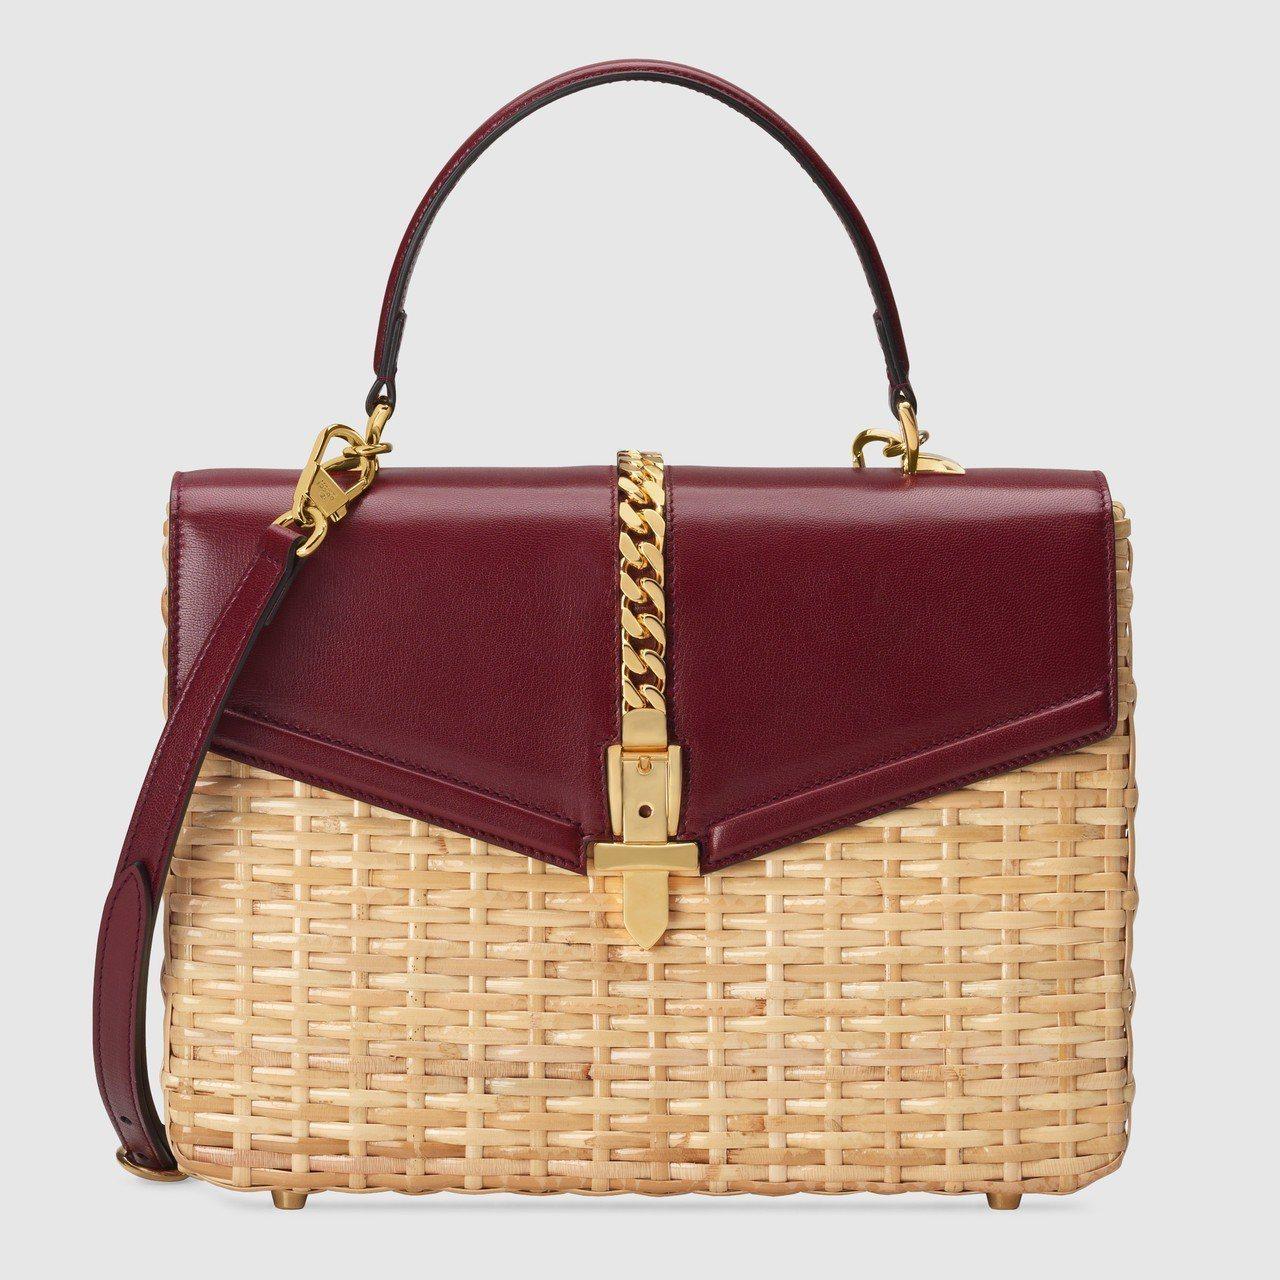 Gucci Sylvie柳條編織酒紅色提包,12萬6,400元。圖/Gucci提...